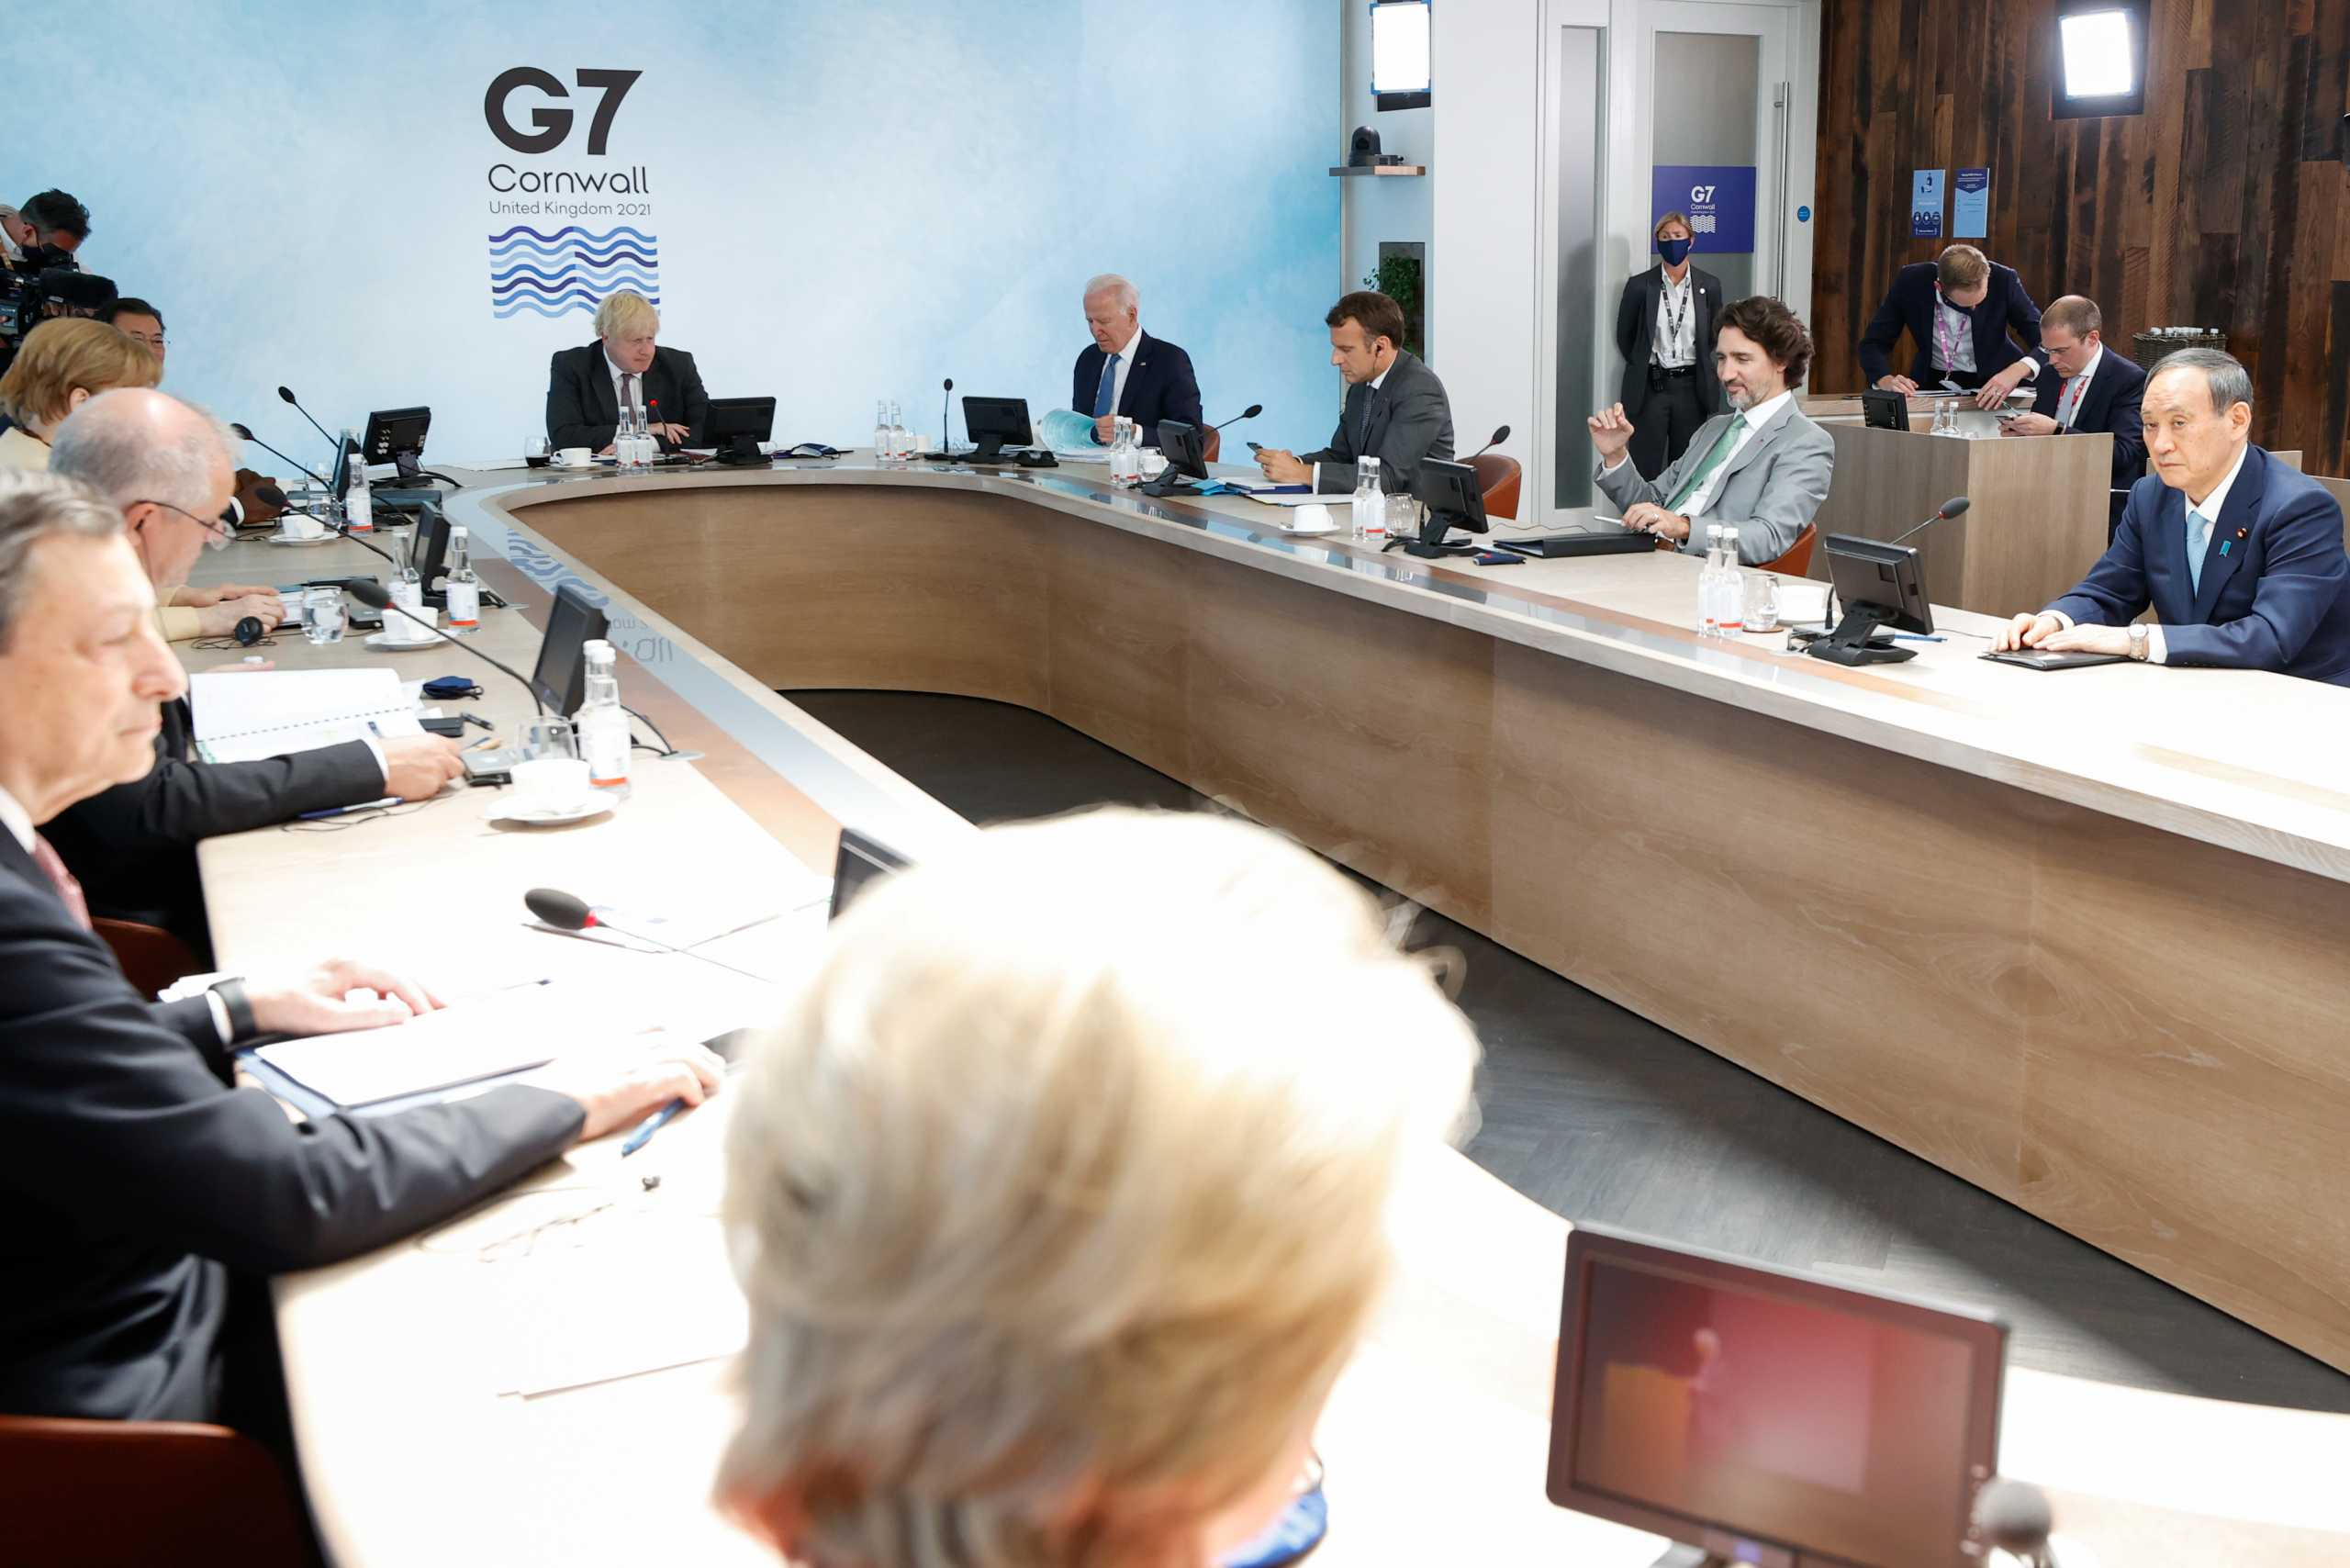 G7: Εμβόλια, Κίνα και Ρωσία στο «τραπέζι» των ηγετών – Όλα όσα συζητήθηκαν και αποφασίστηκαν